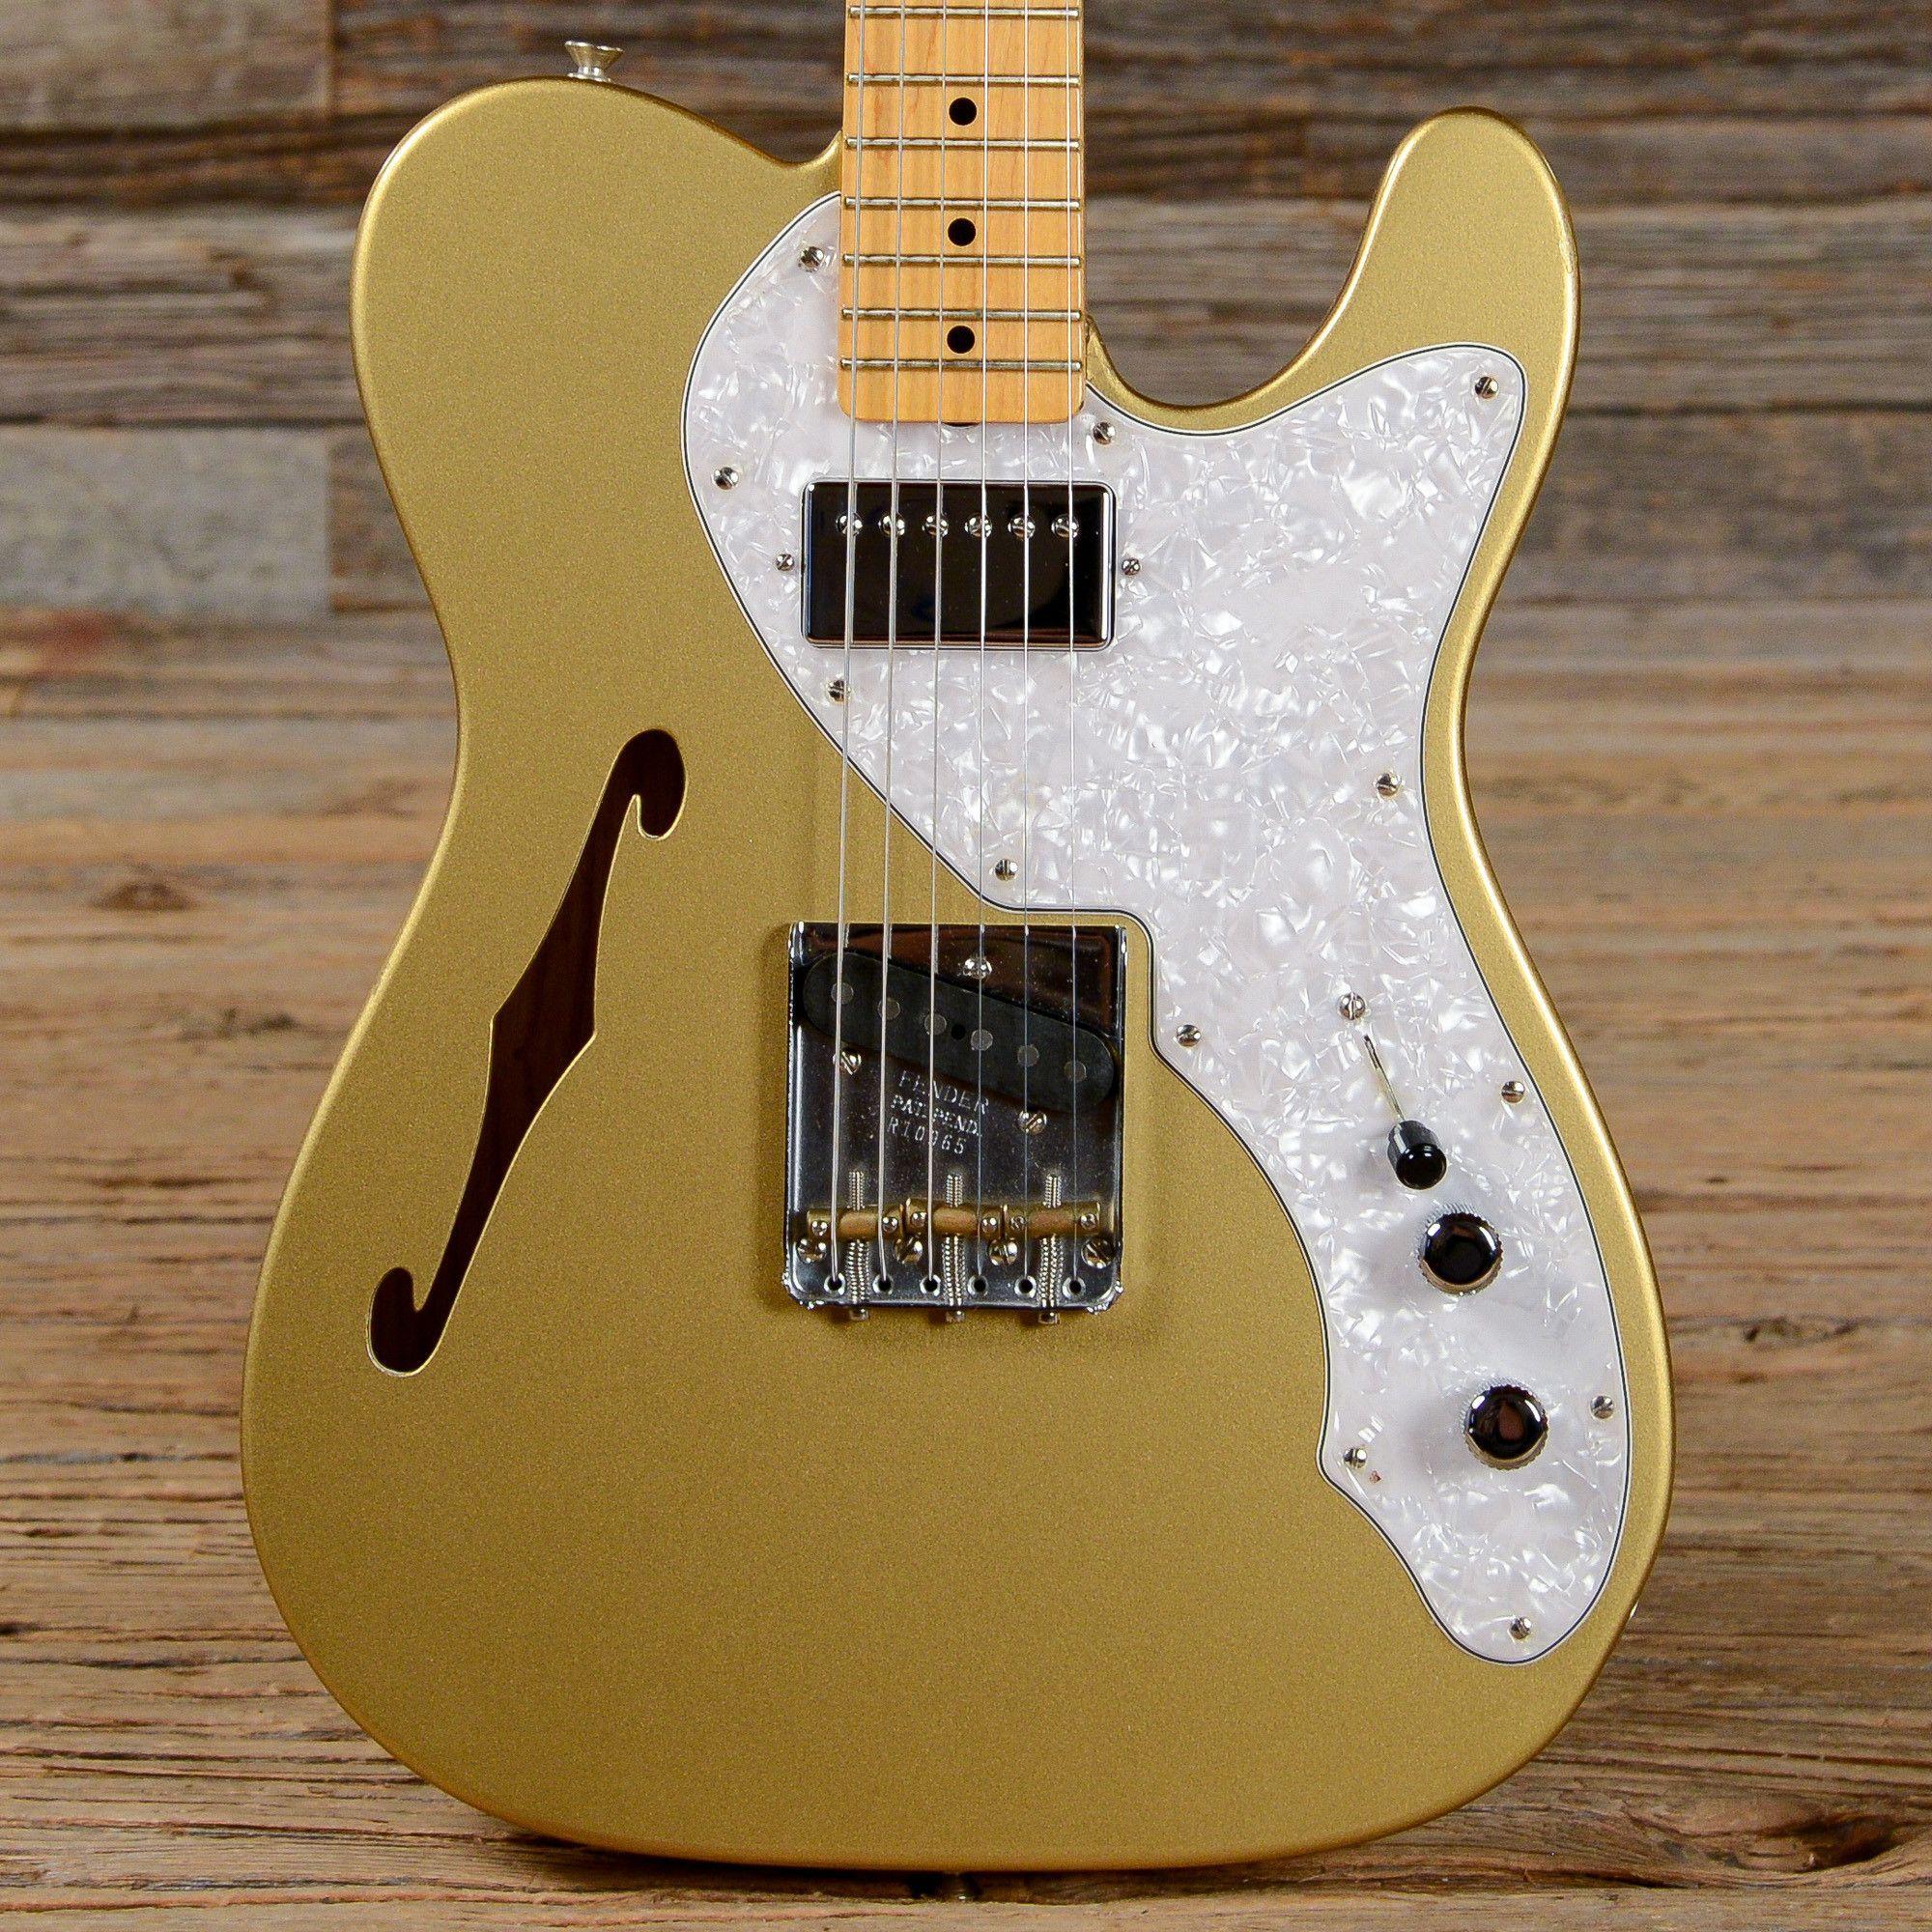 1969 Telecaster Thinline Wiring Diagram Electrical Diagrams Fender 69 Guitar